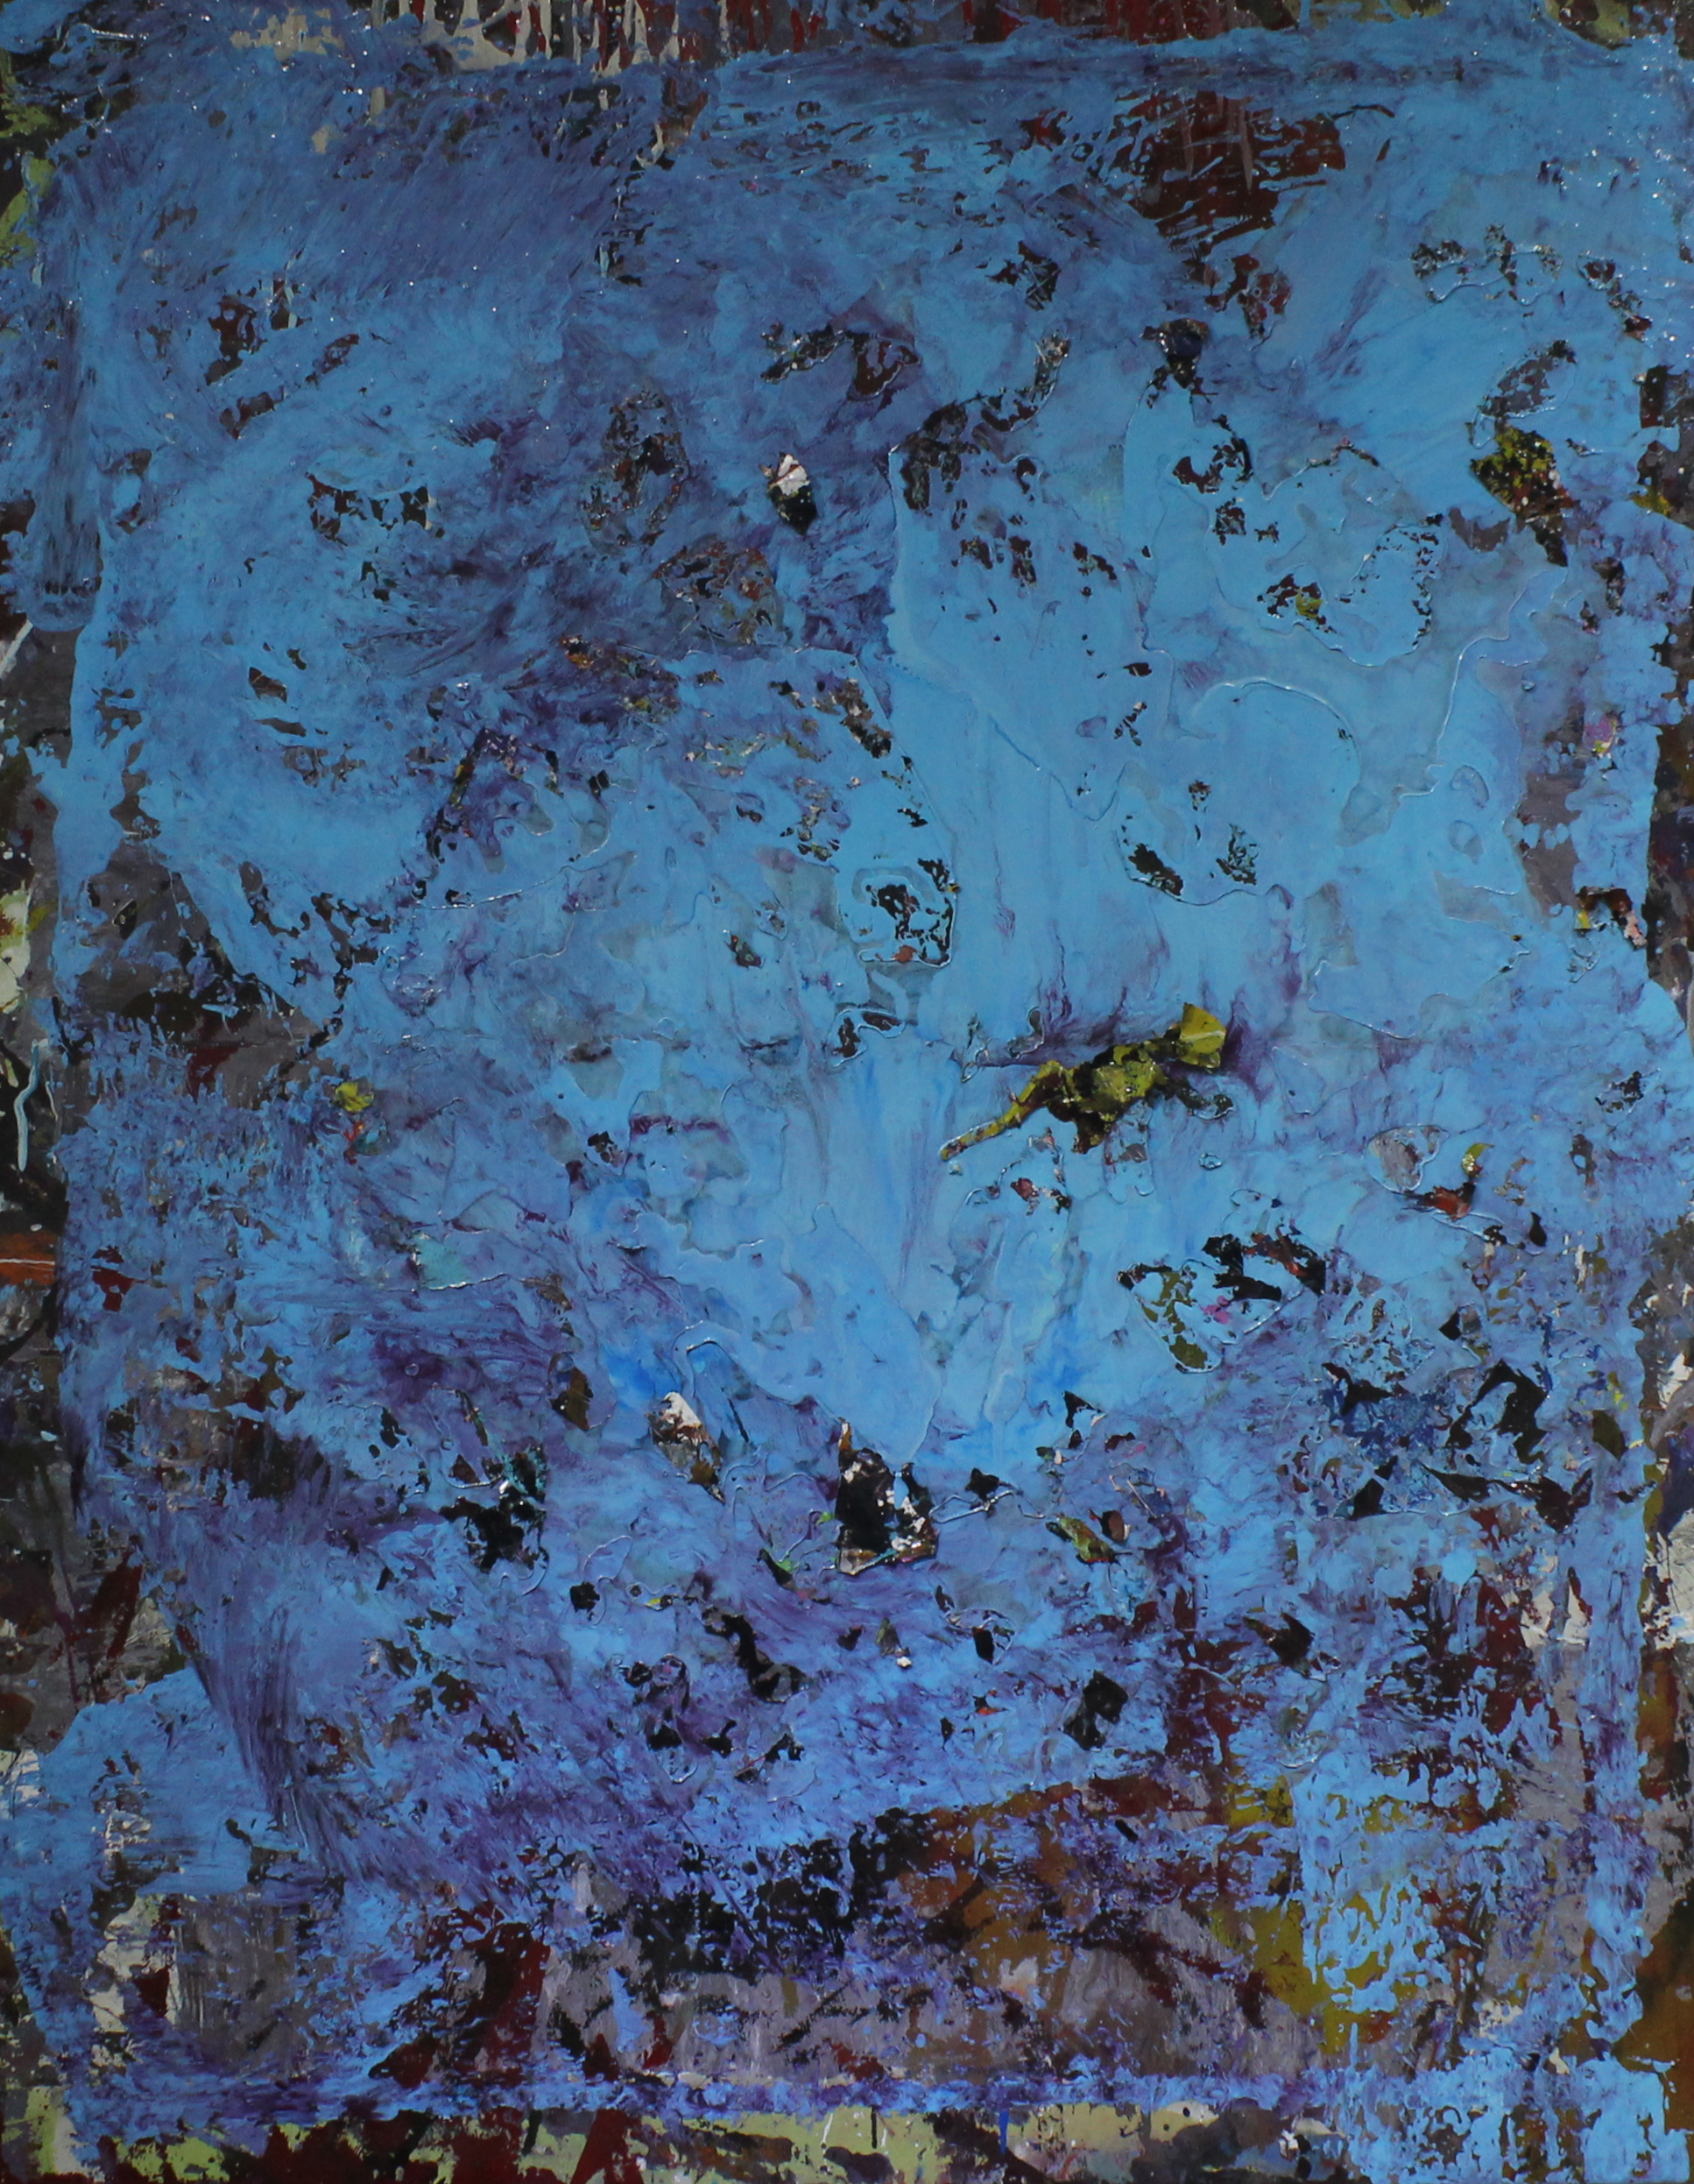 Untitled, 2013, enamel paint on canvas, 122 x 91 cm